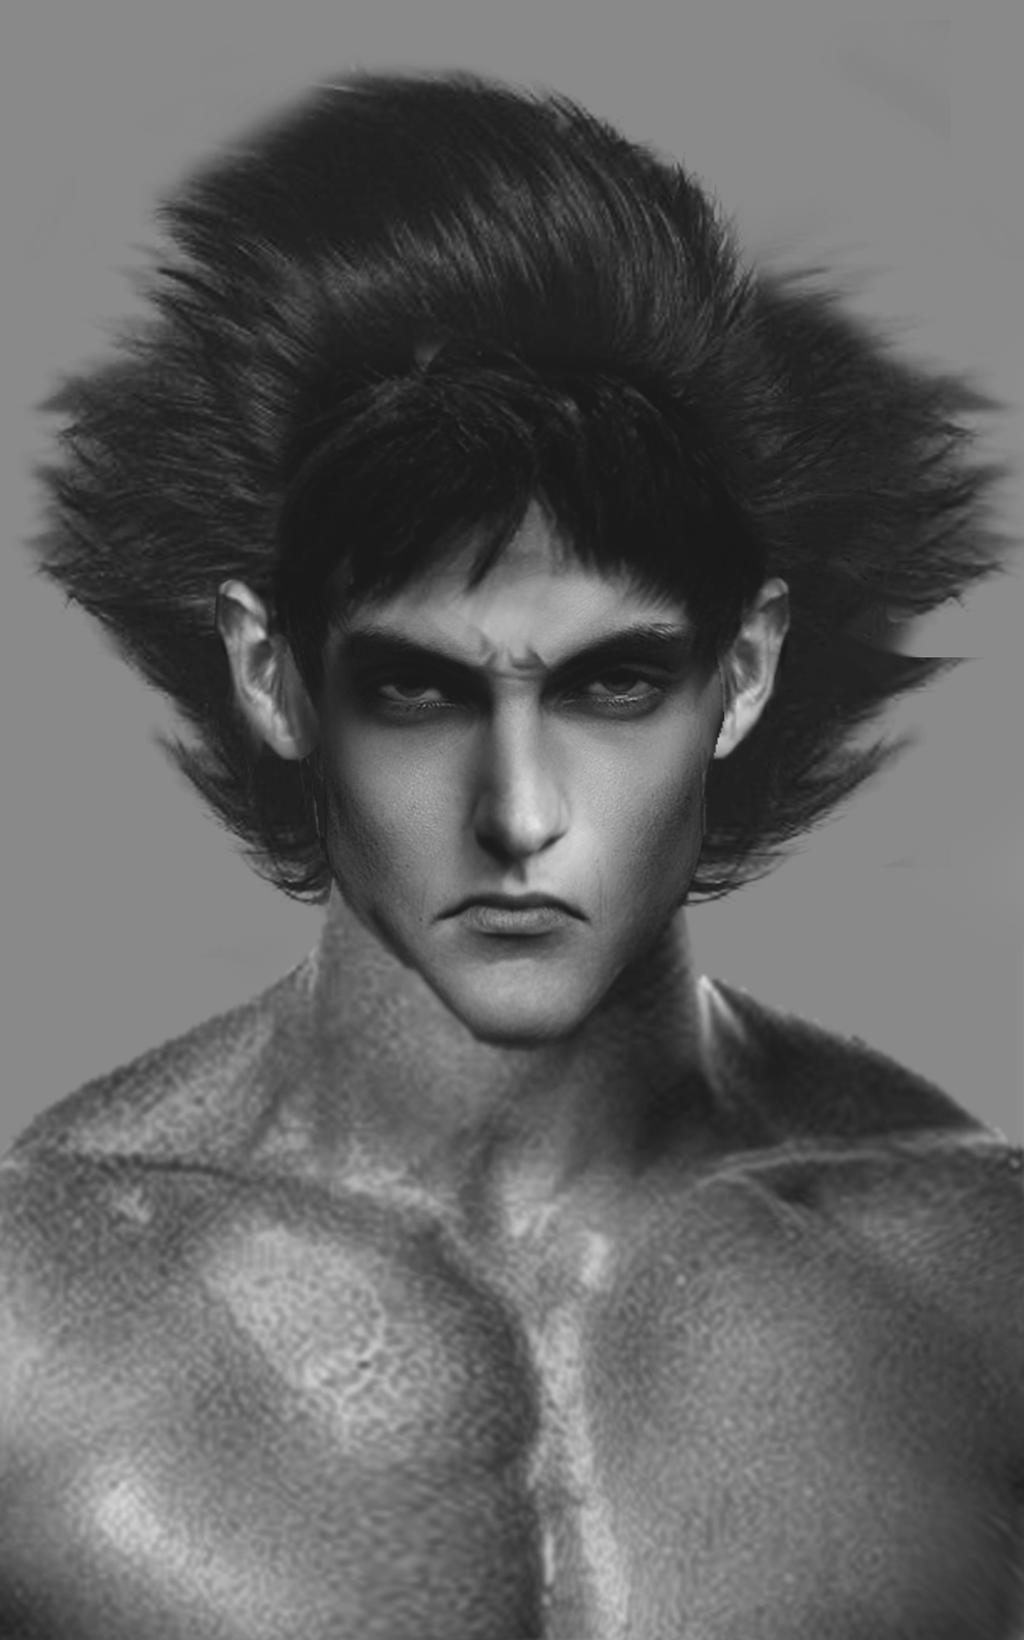 Goku real life by Shibuz4 on DeviantArt